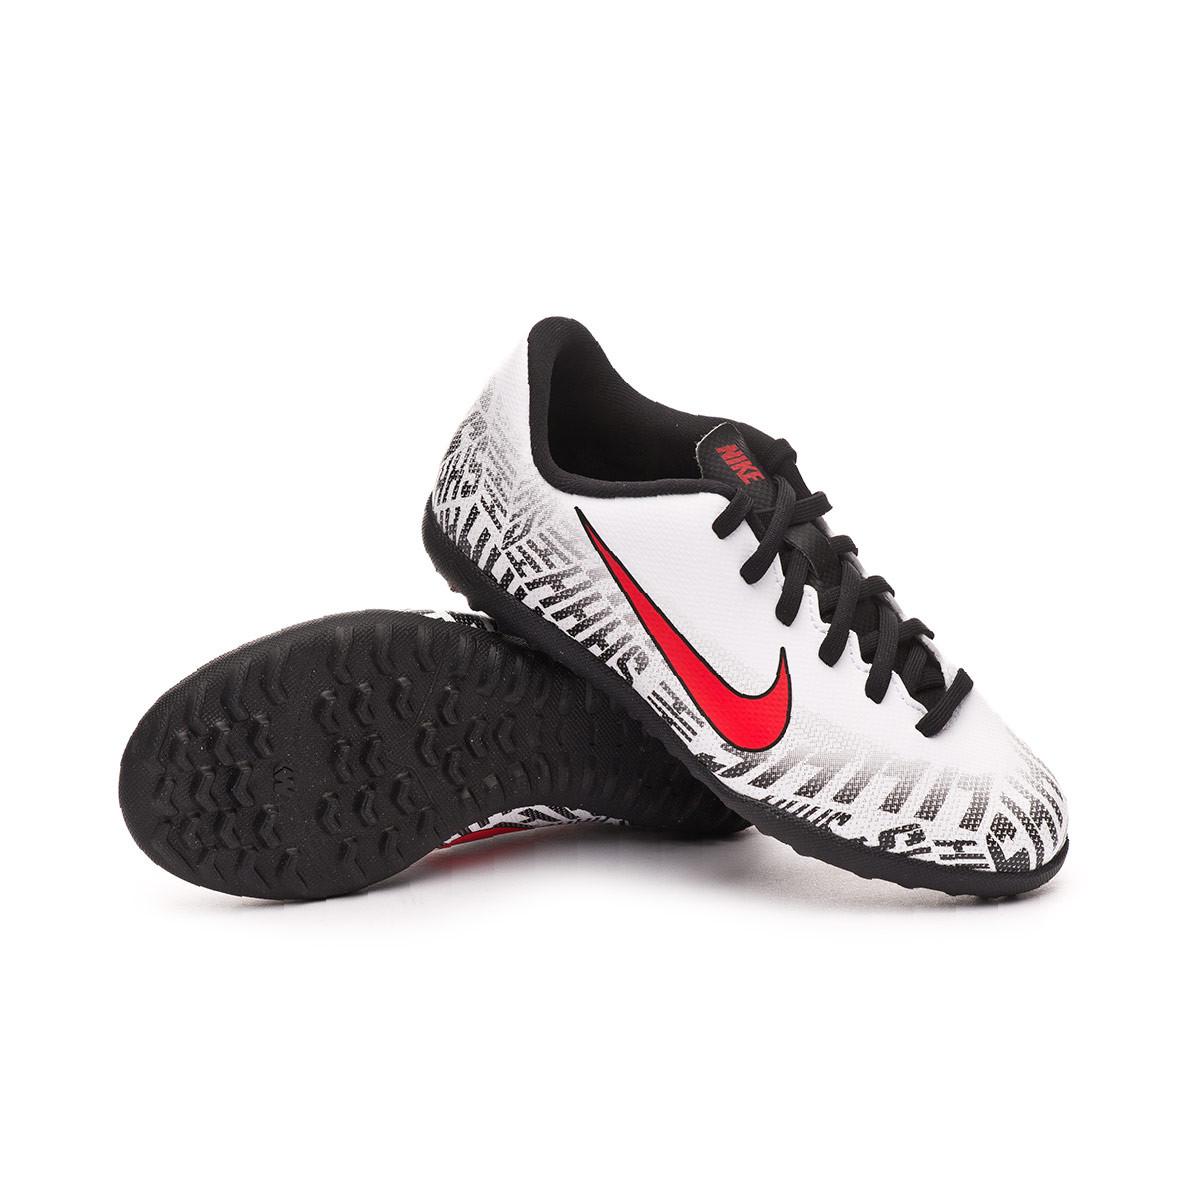 Zapatilla Nike Mercurial Vapor XII Club Neymar Jr Turf Niño